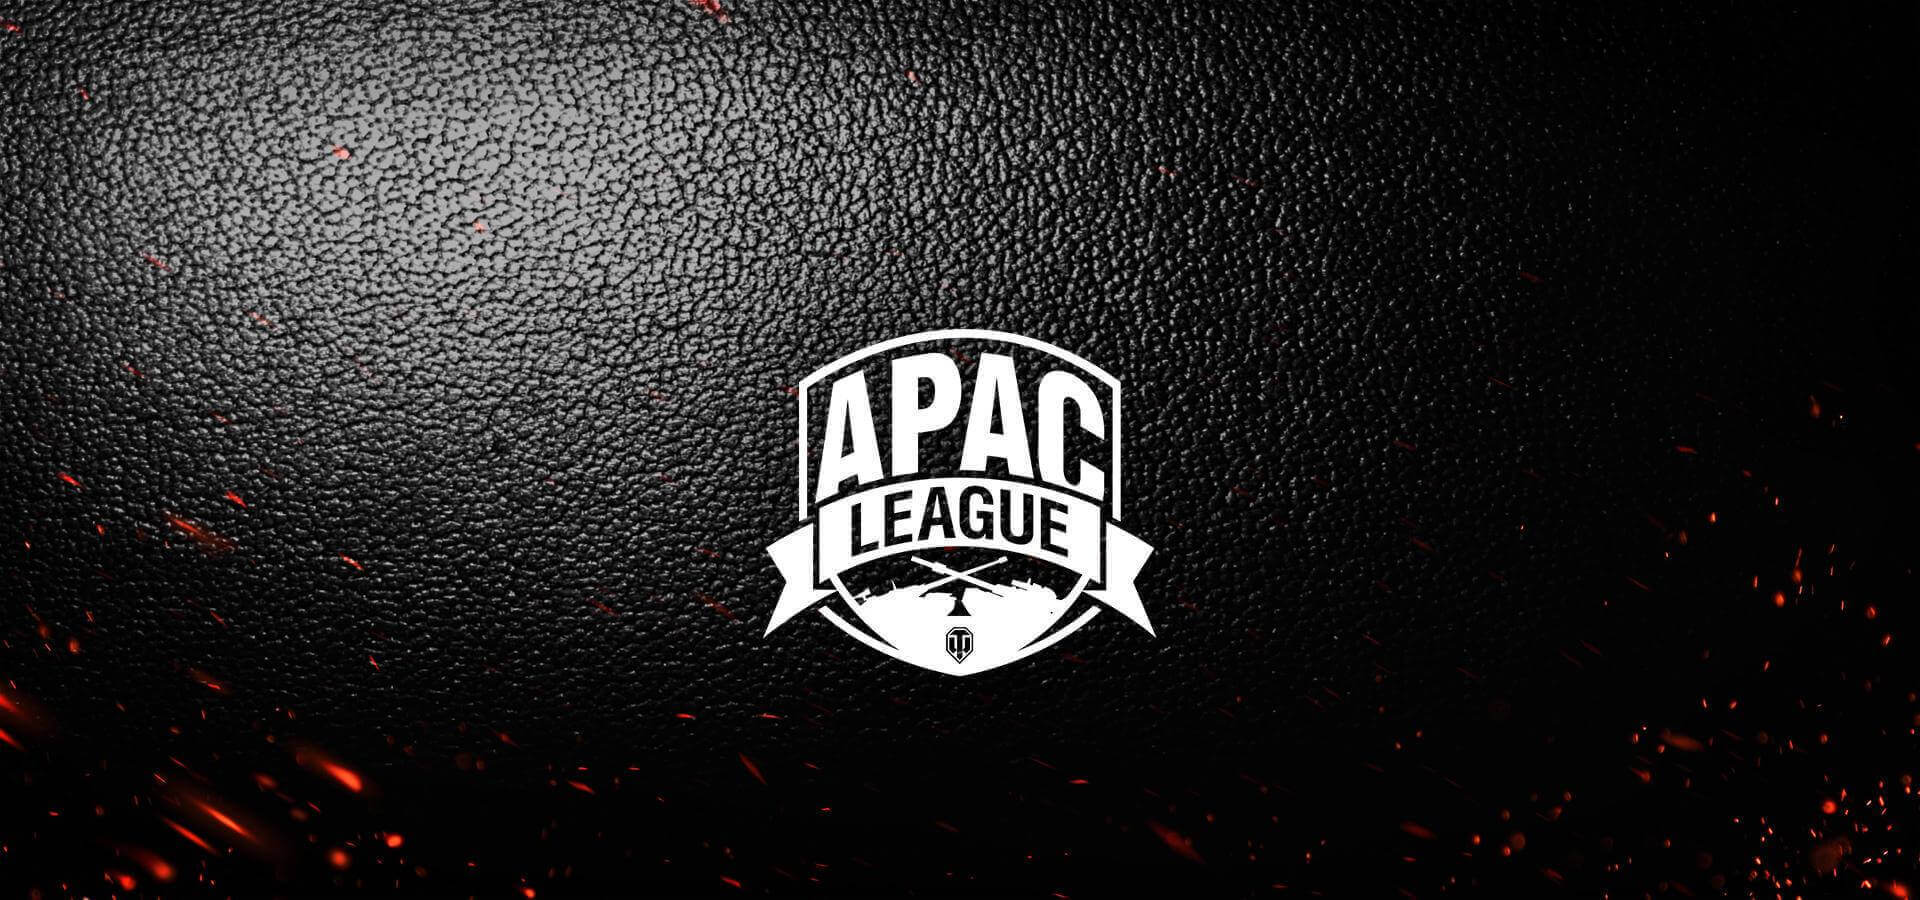 Major League / Masters Rules & Regulations   The APAC League